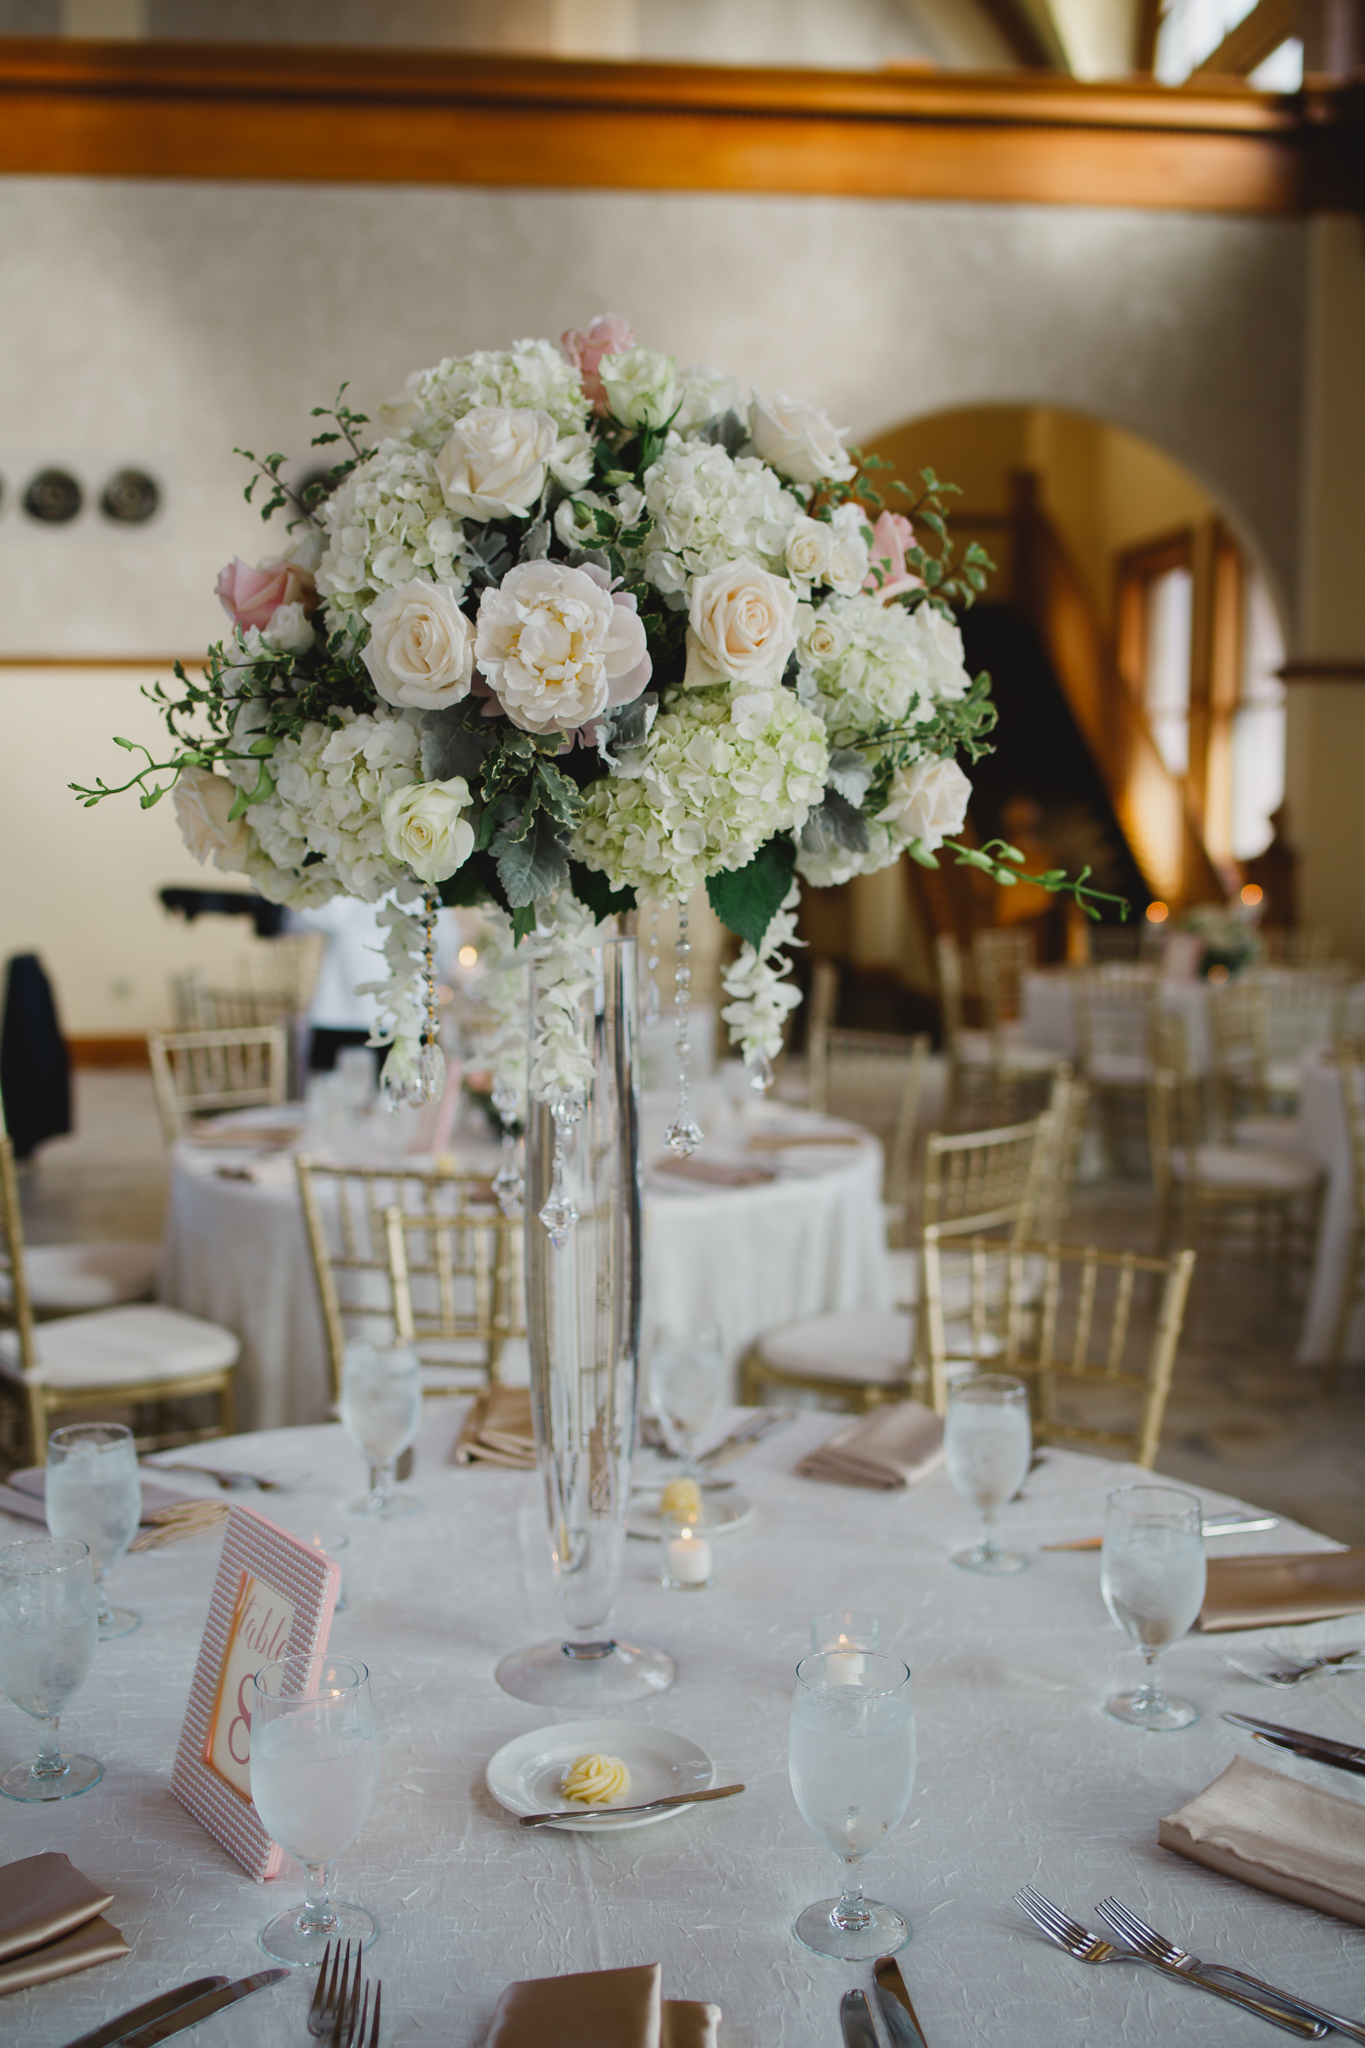 Michael and Kelly - the ashton depot - wedding DFW - wedding photographer- elizalde photography (80 of 150).jpg